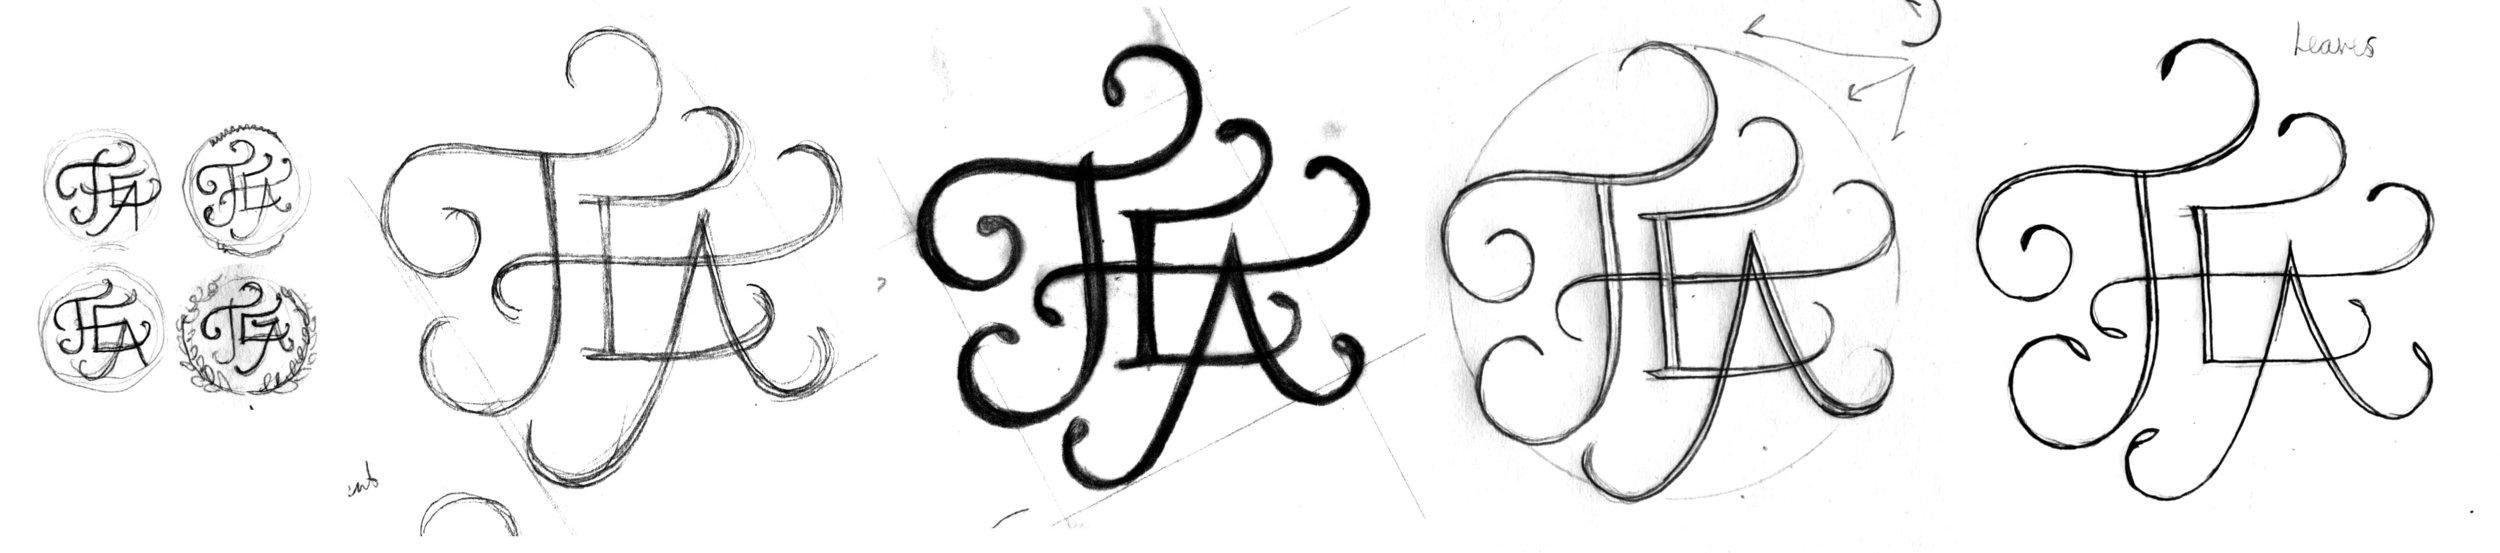 Sketch progression of the swashed TEA lettering